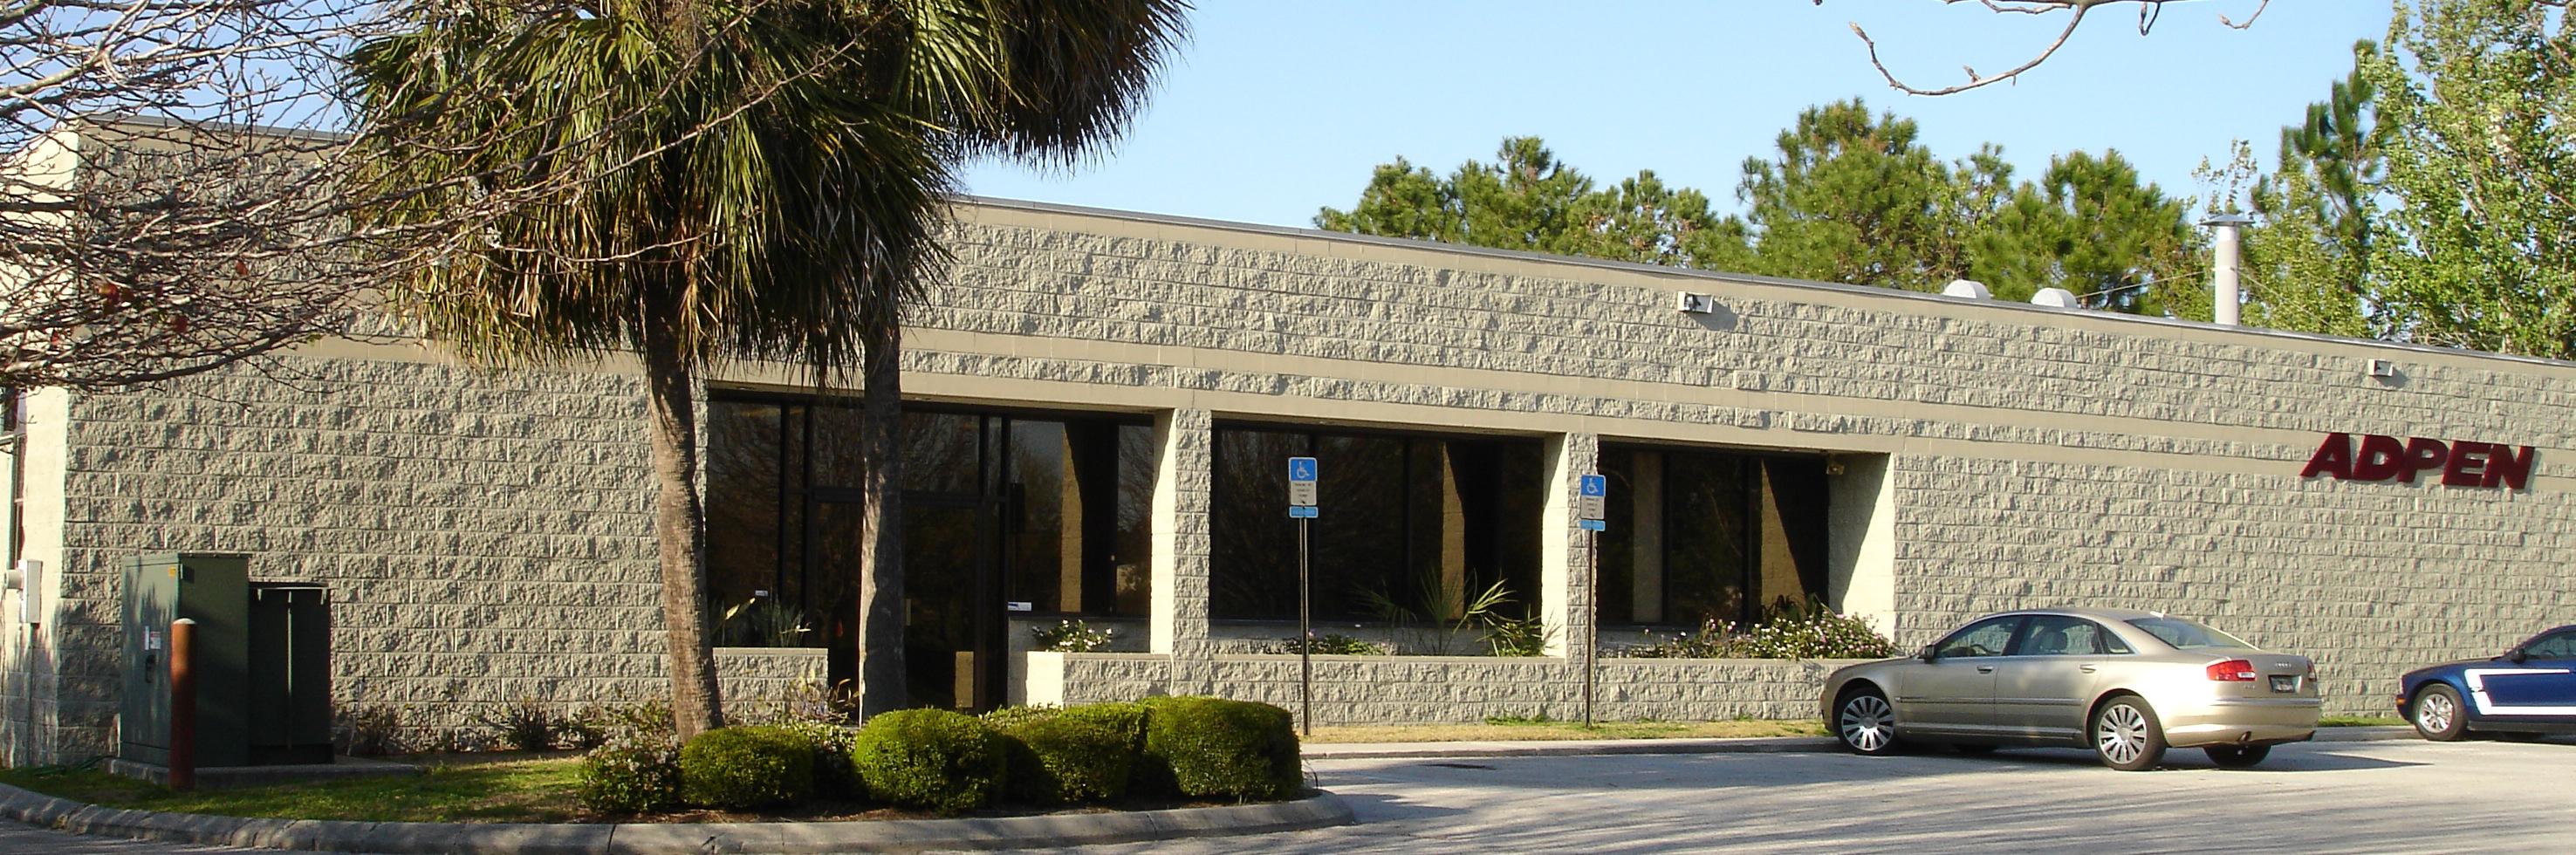 The exterior of ADPEN Laboratories in Jacksonville, FL